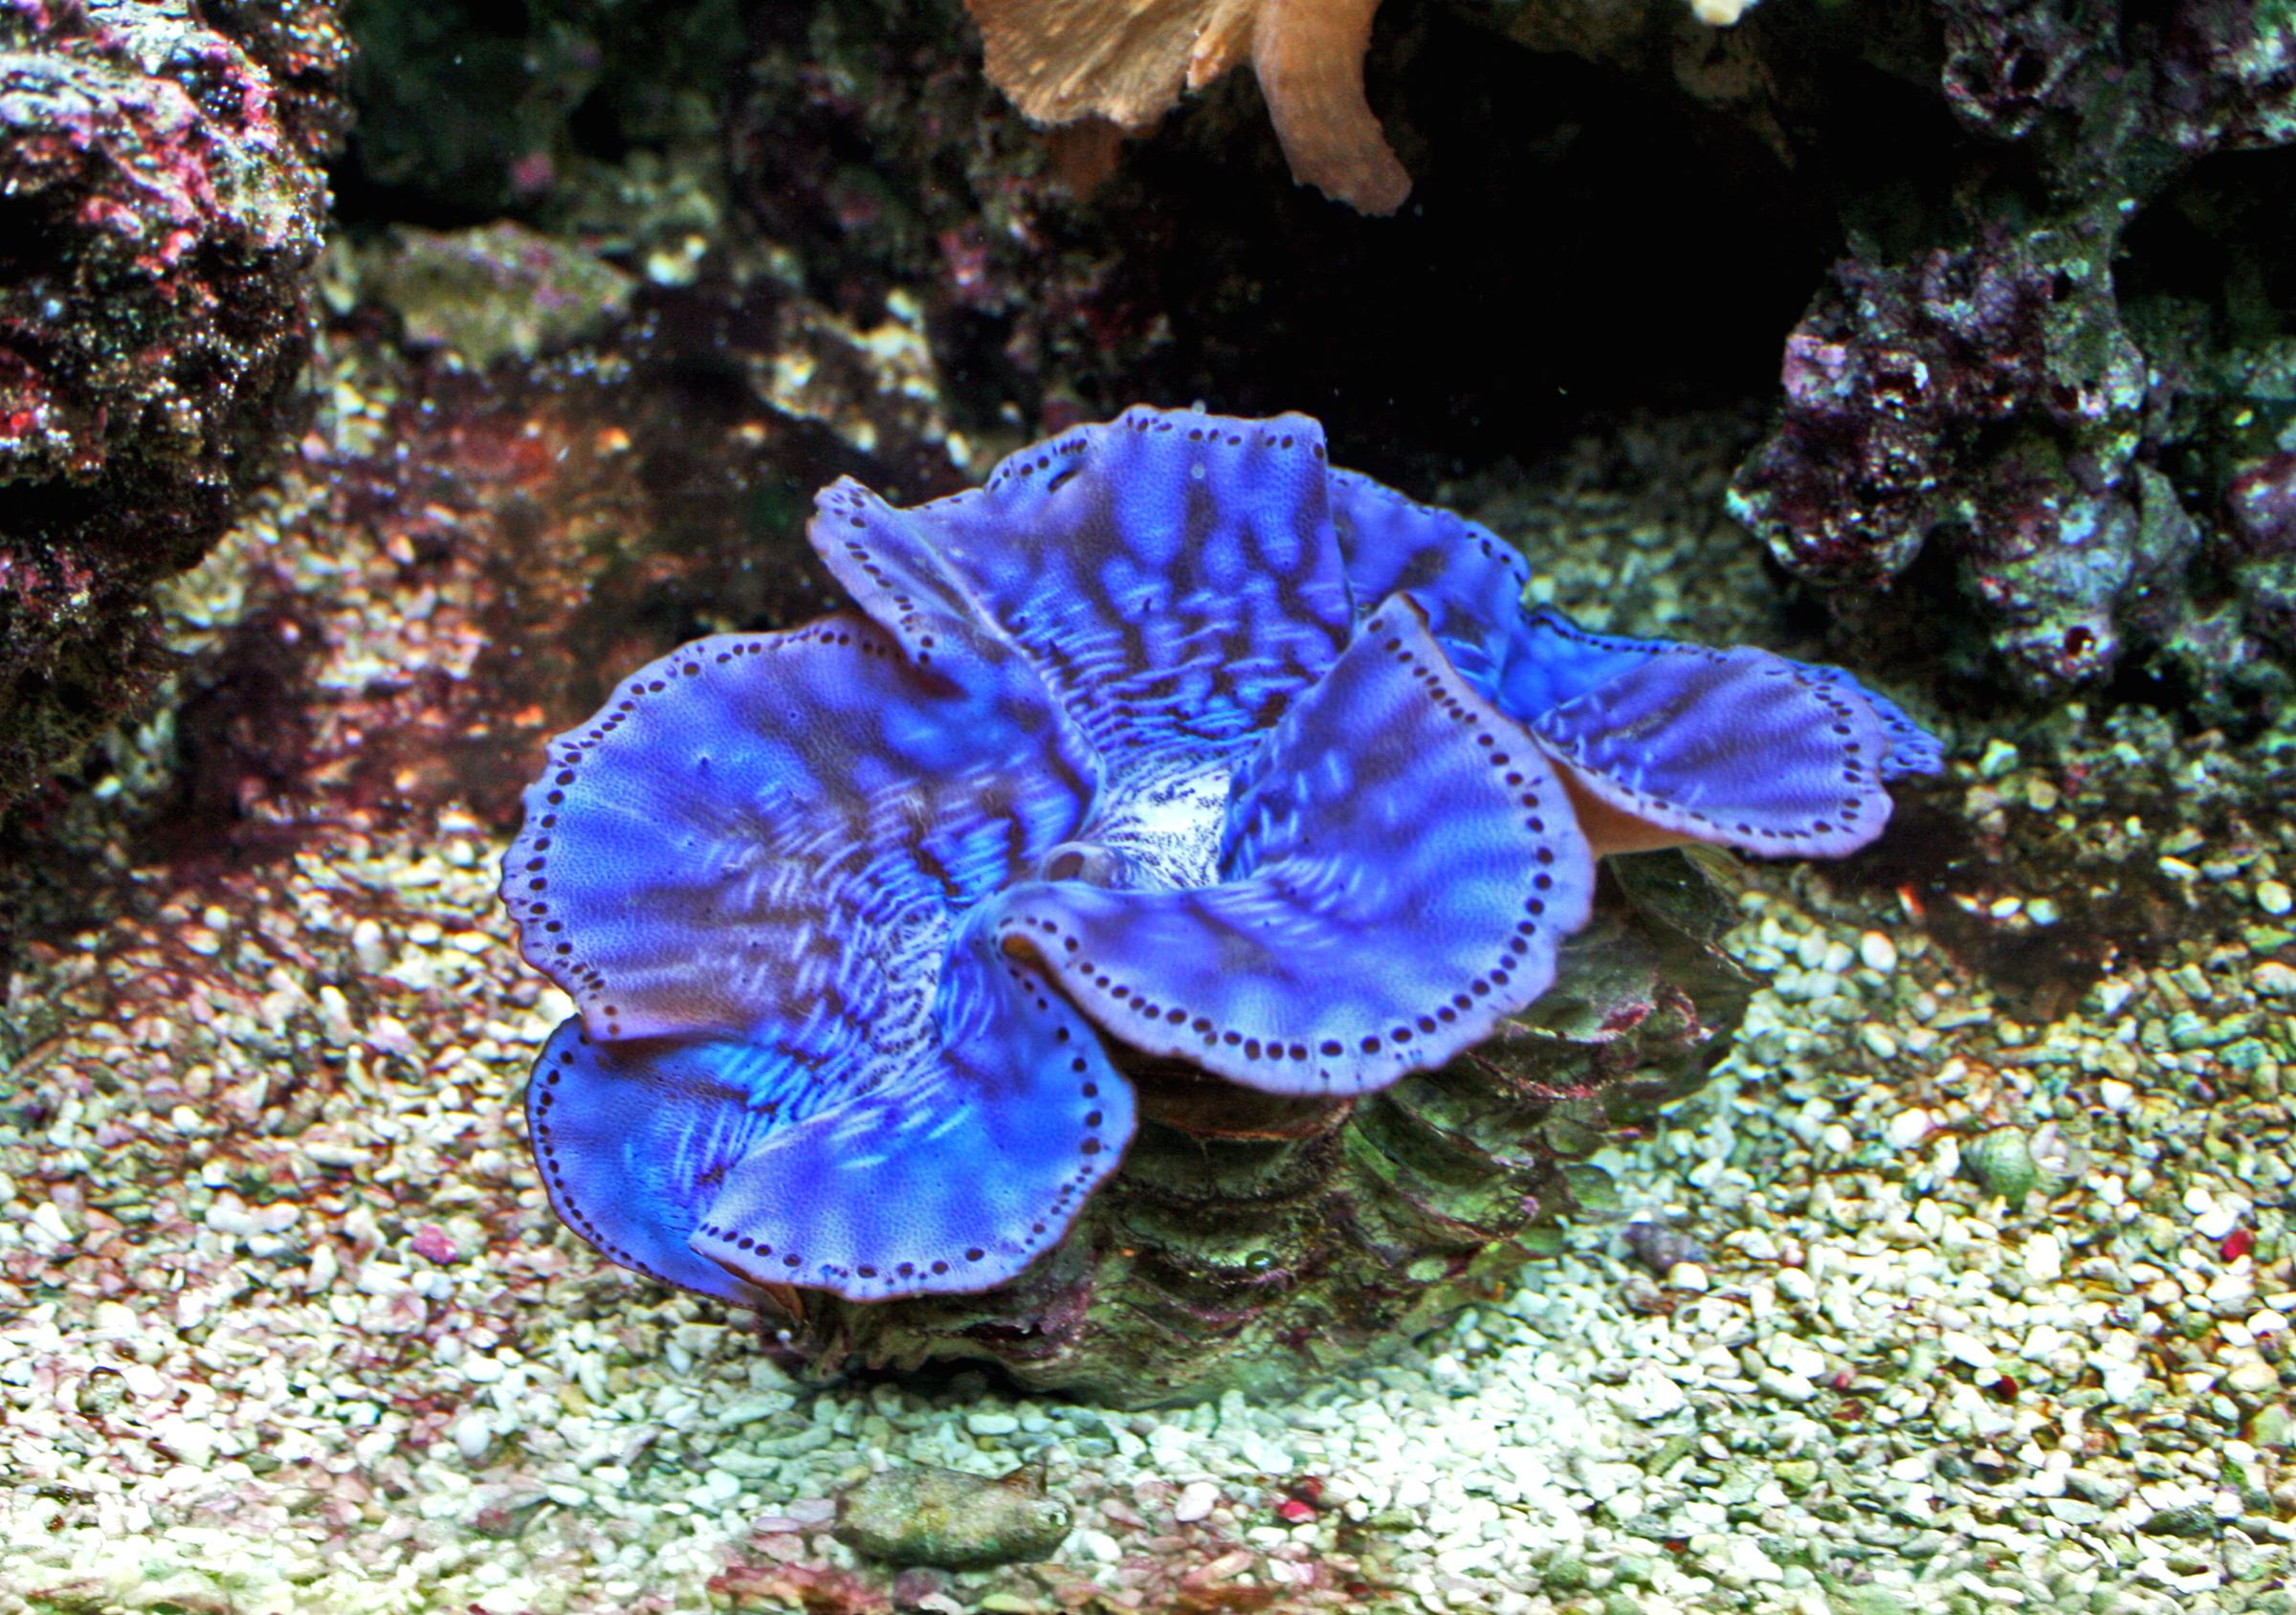 File:Tridacna maxima 1.jpg - Wikimedia Commons